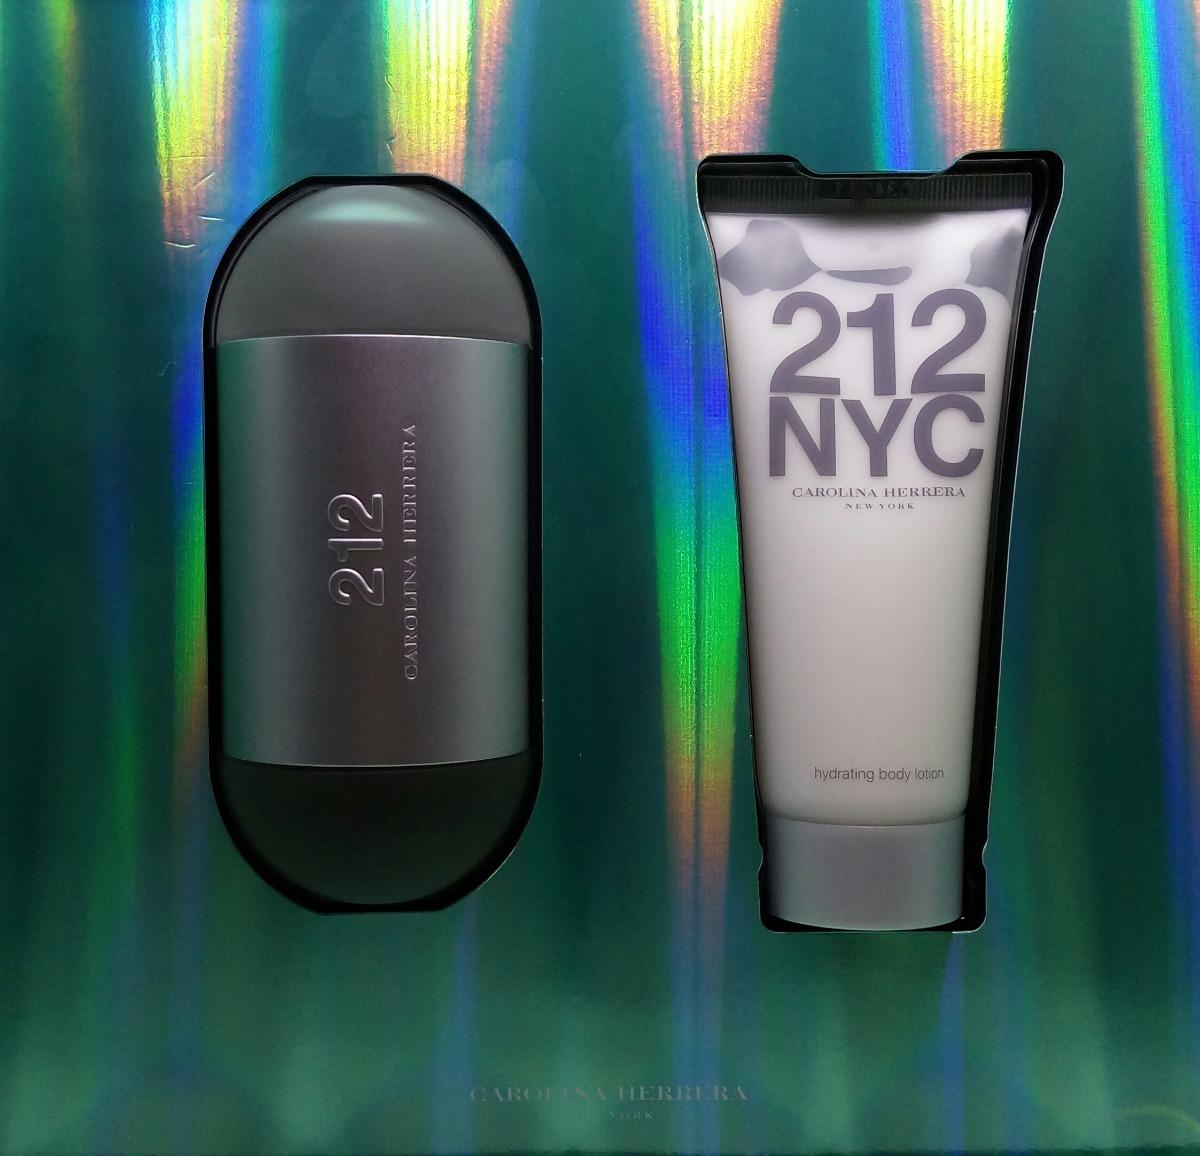 45c6fbf7f kit perfume 212 nyc 100 ml+hidratante 100 ml original. Carregando zoom.